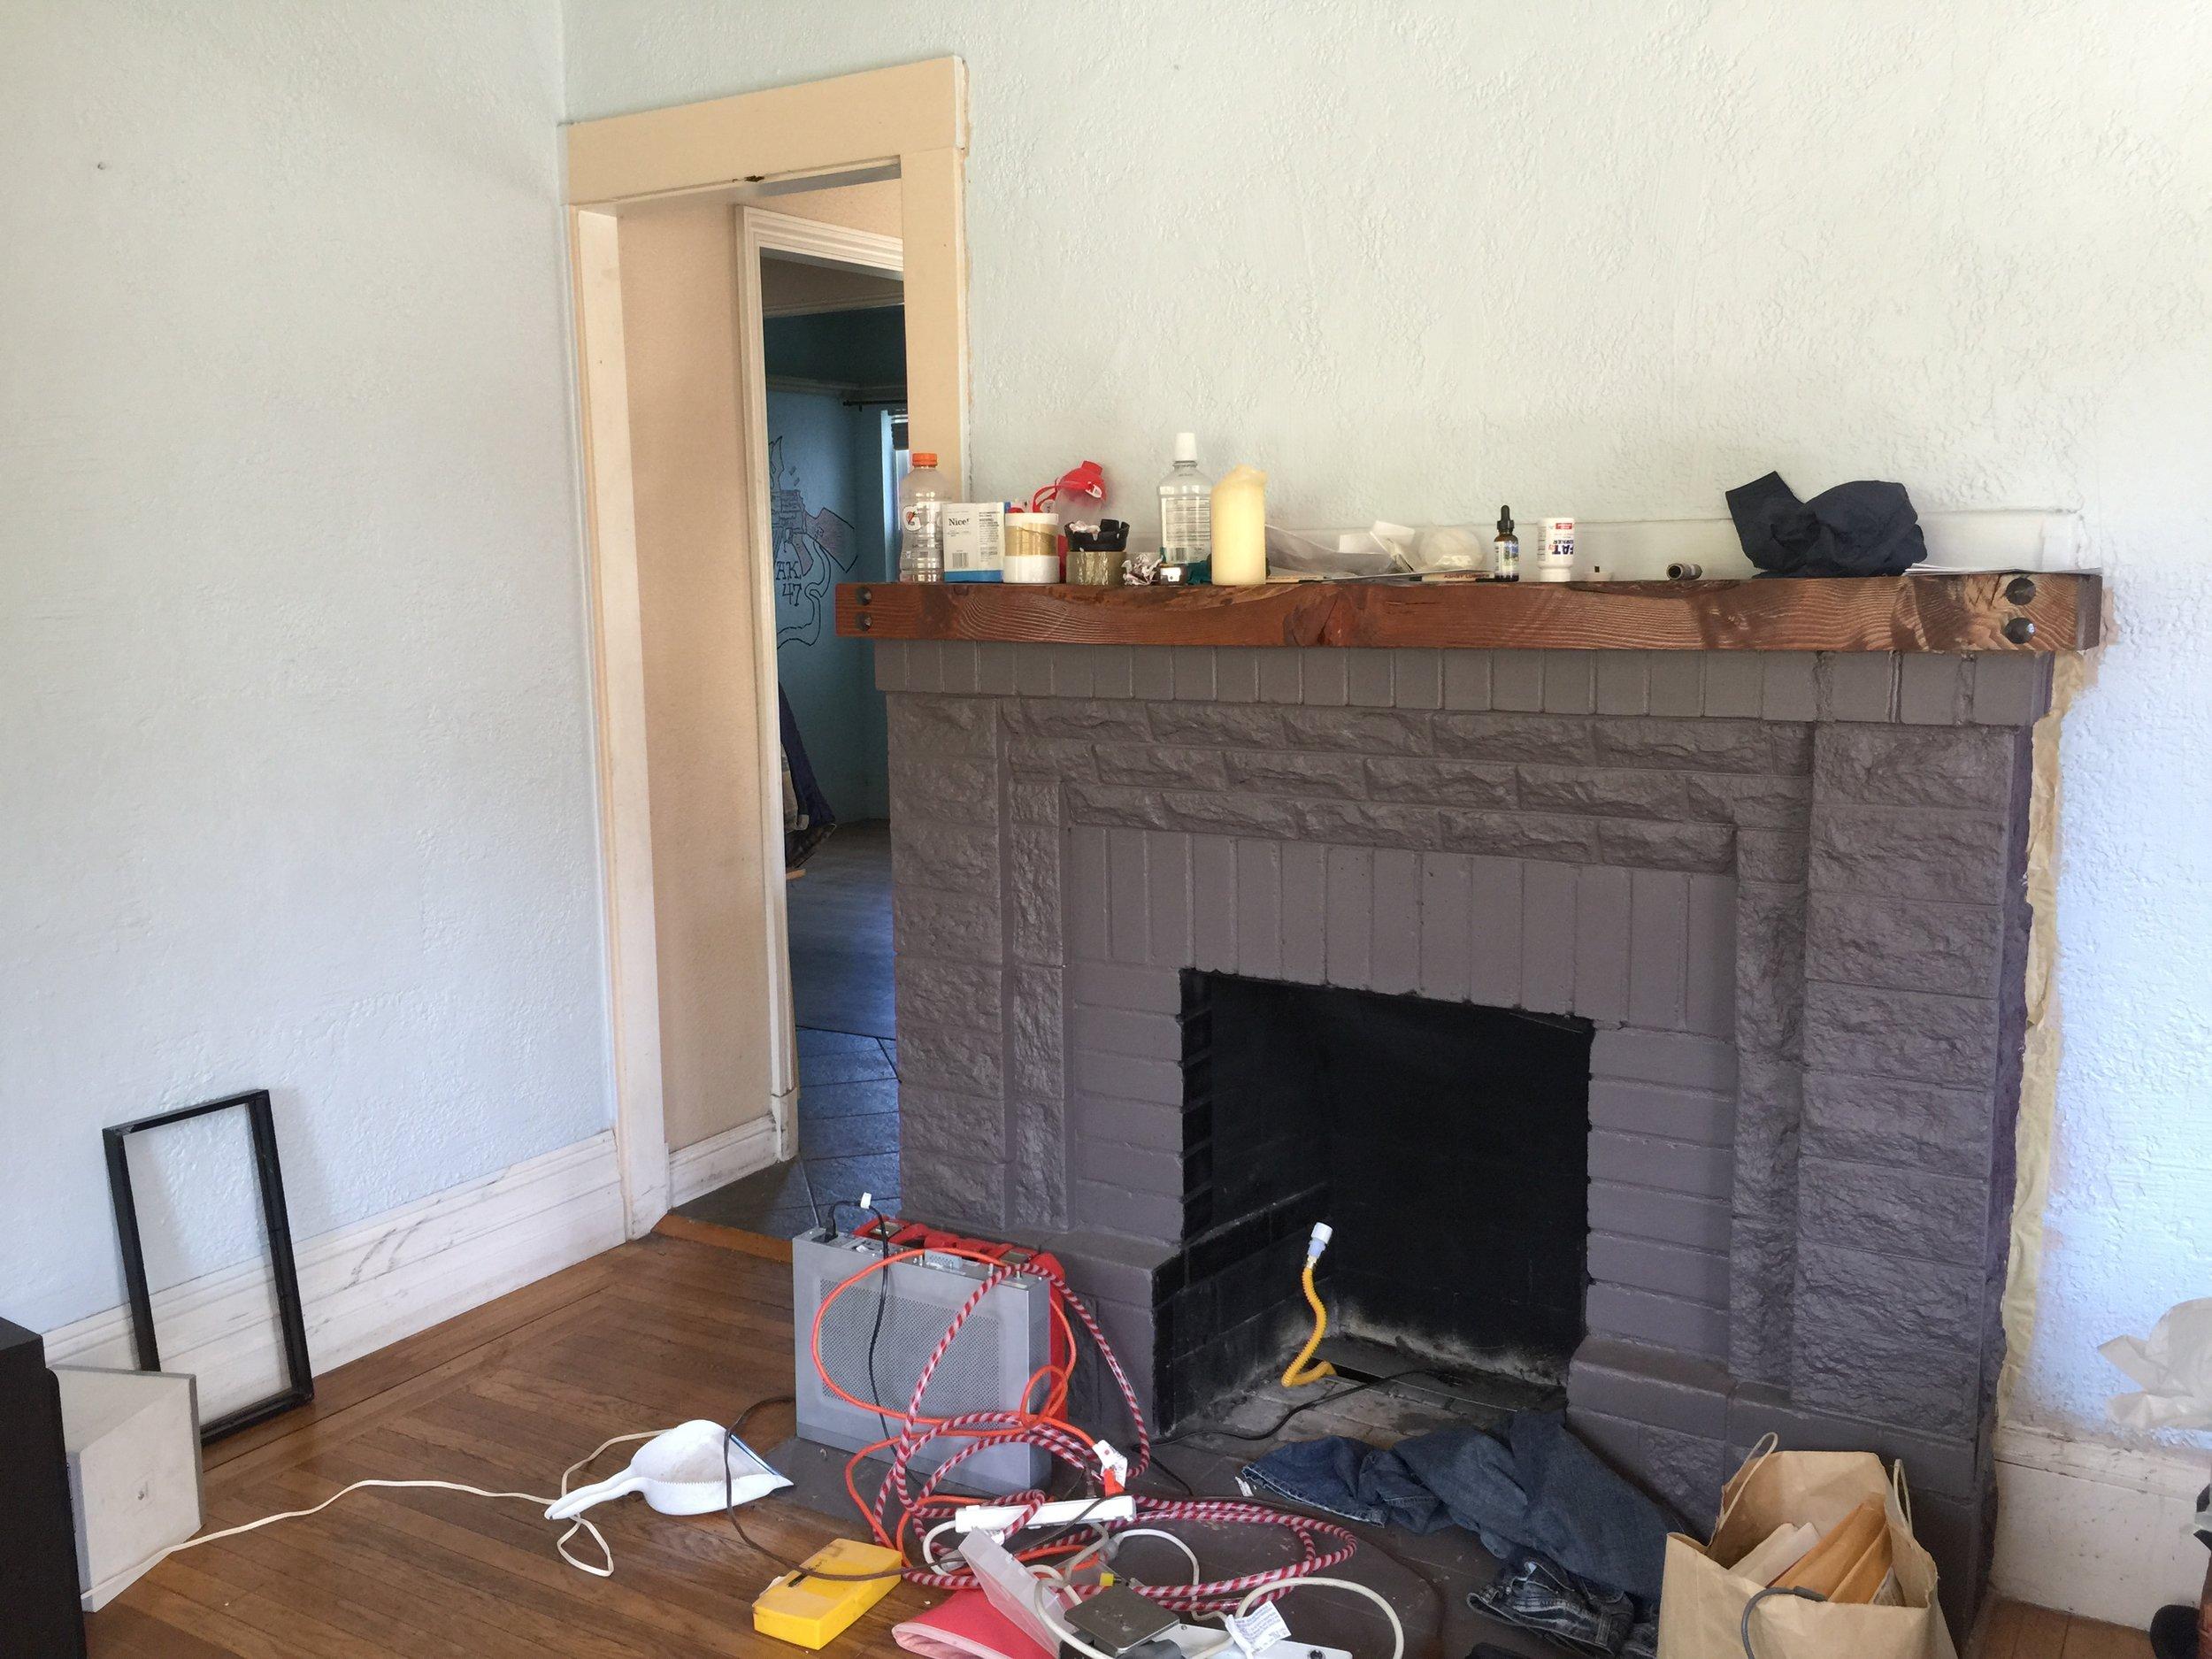 FireplaceWall-Before.JPG